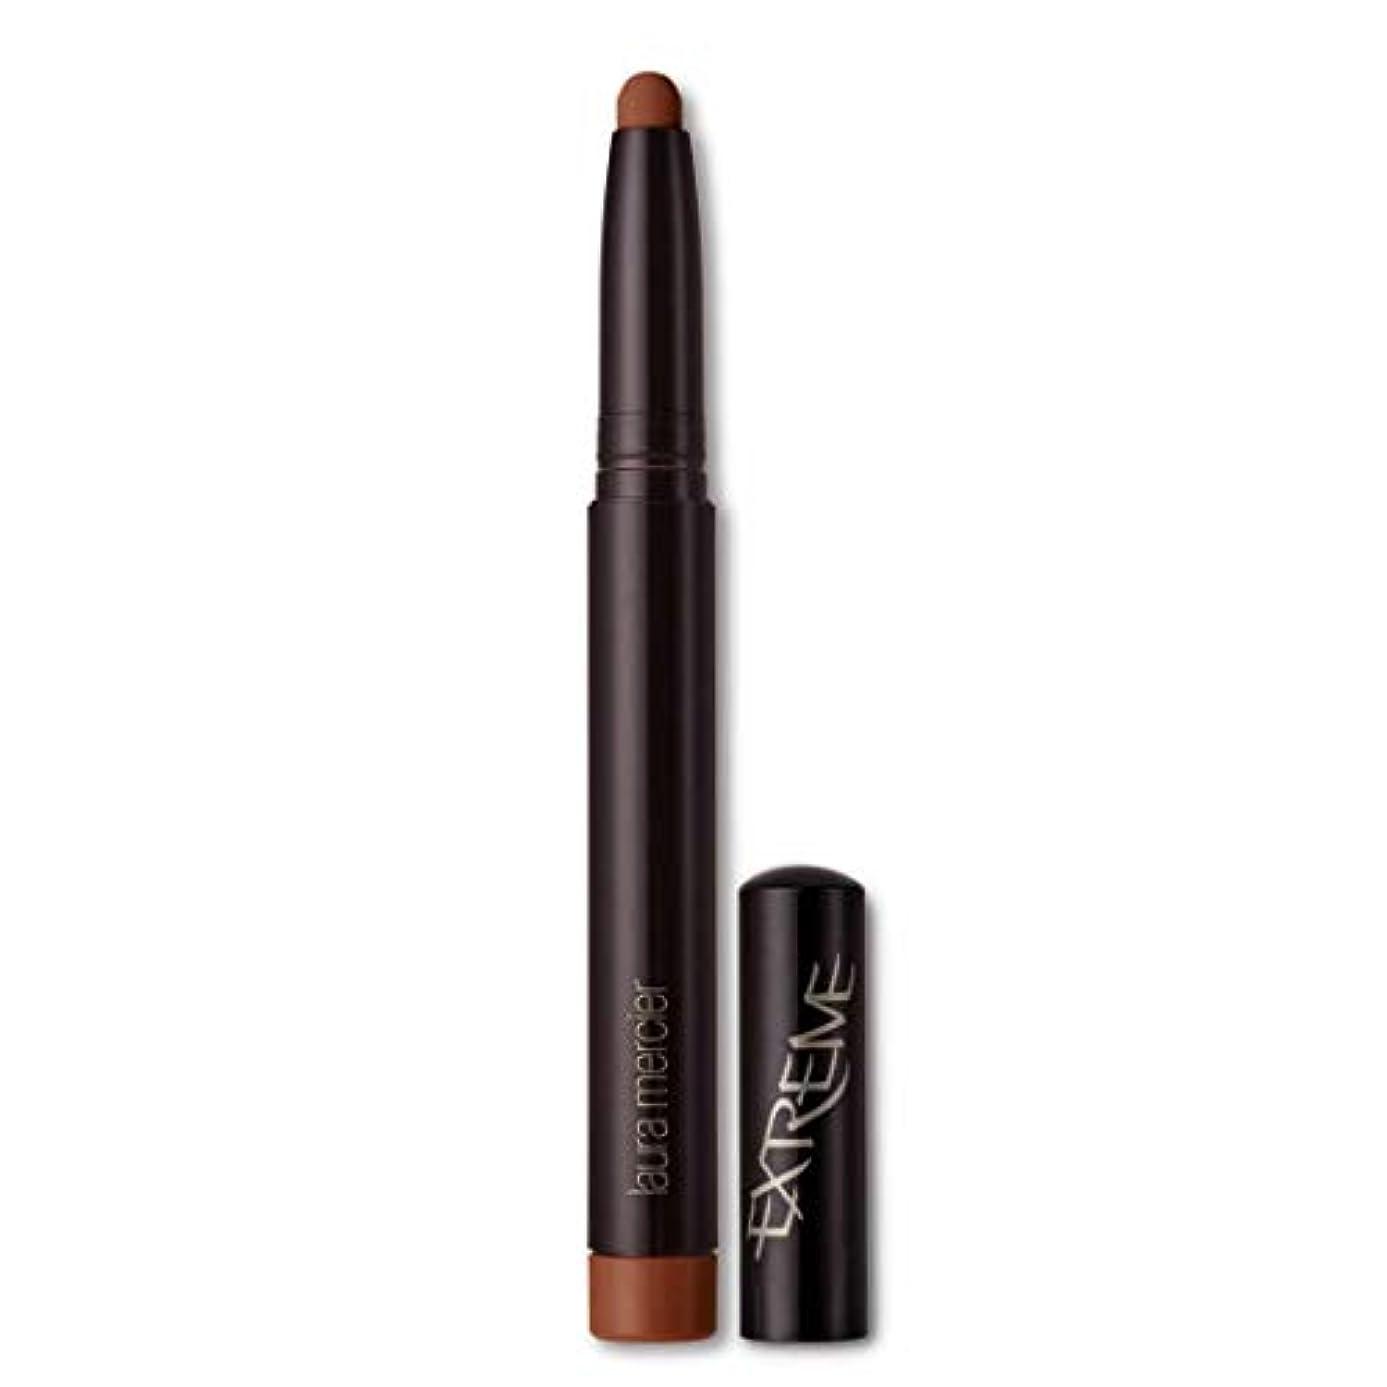 労苦形成剥離Laura Mercier Velour Intense Pigment Rich Colour Extreme Matte Lipstick - Rock